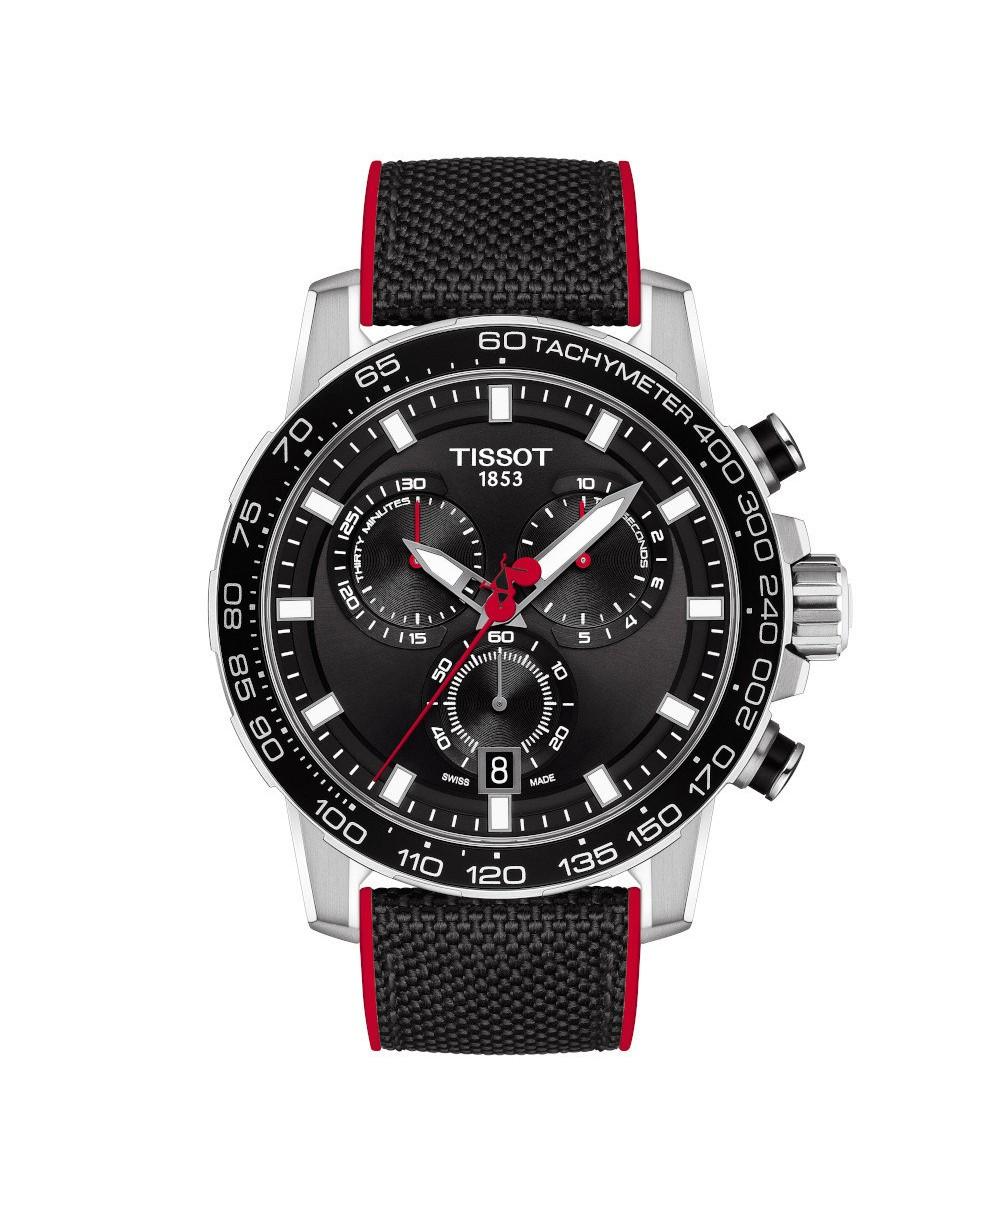 Reloj Tissot Supersport Chrono Vuelta Special Edition